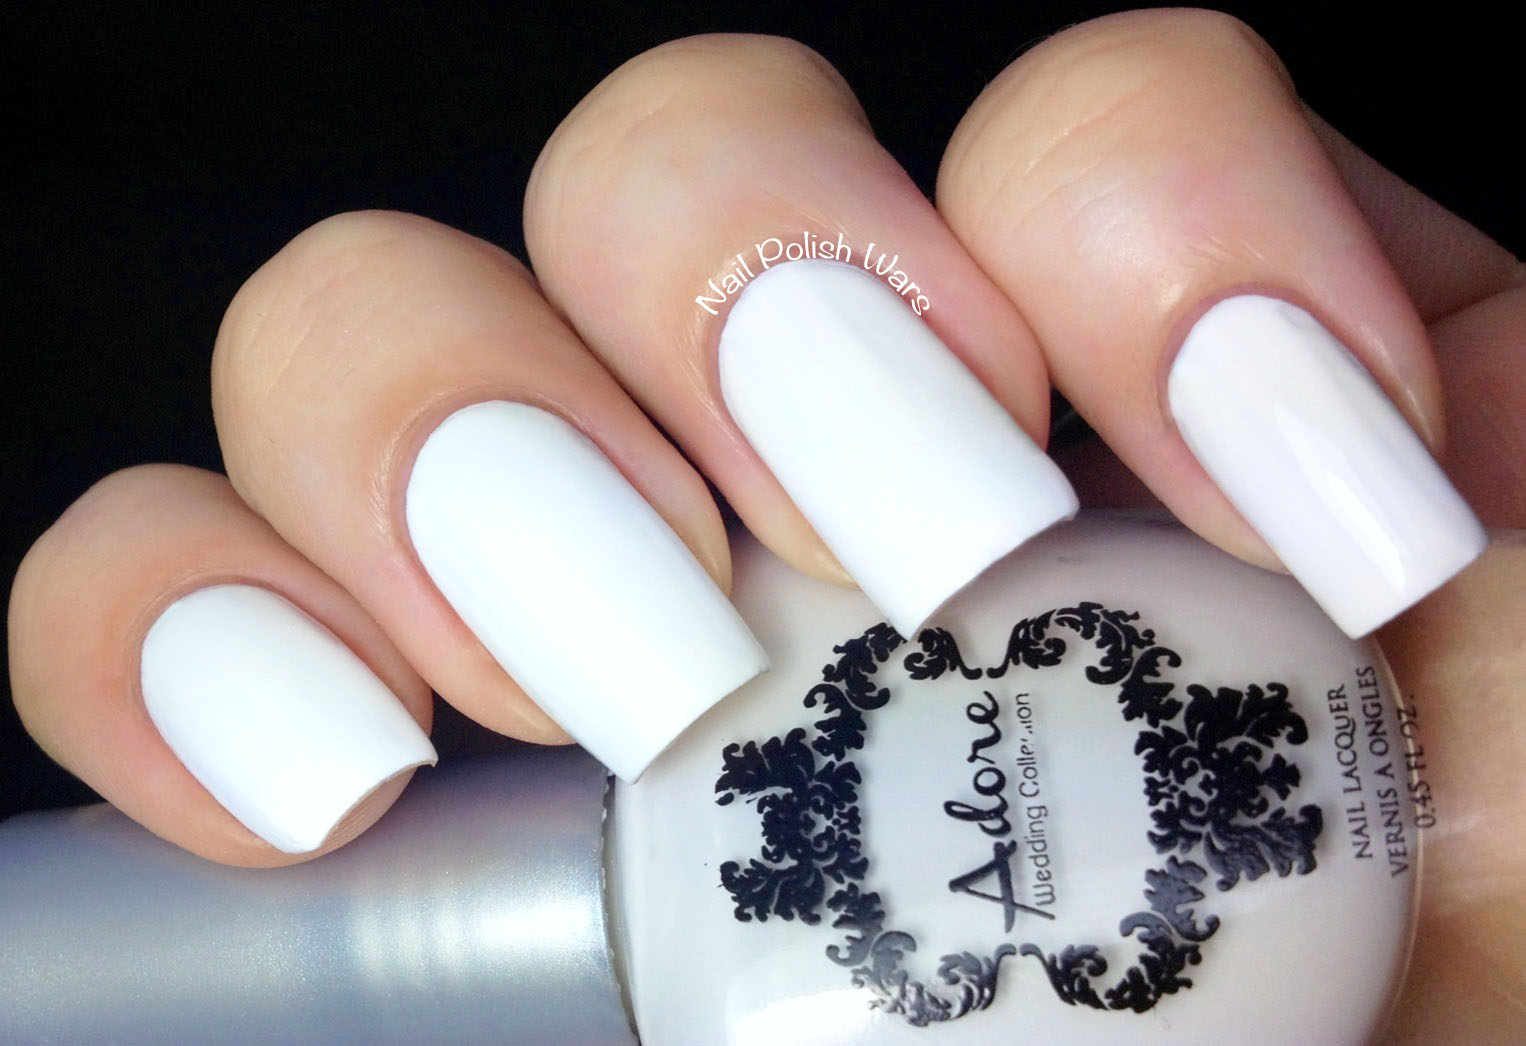 Luxury White Matte Nail Polish Illustration - Nail Art Ideas ...